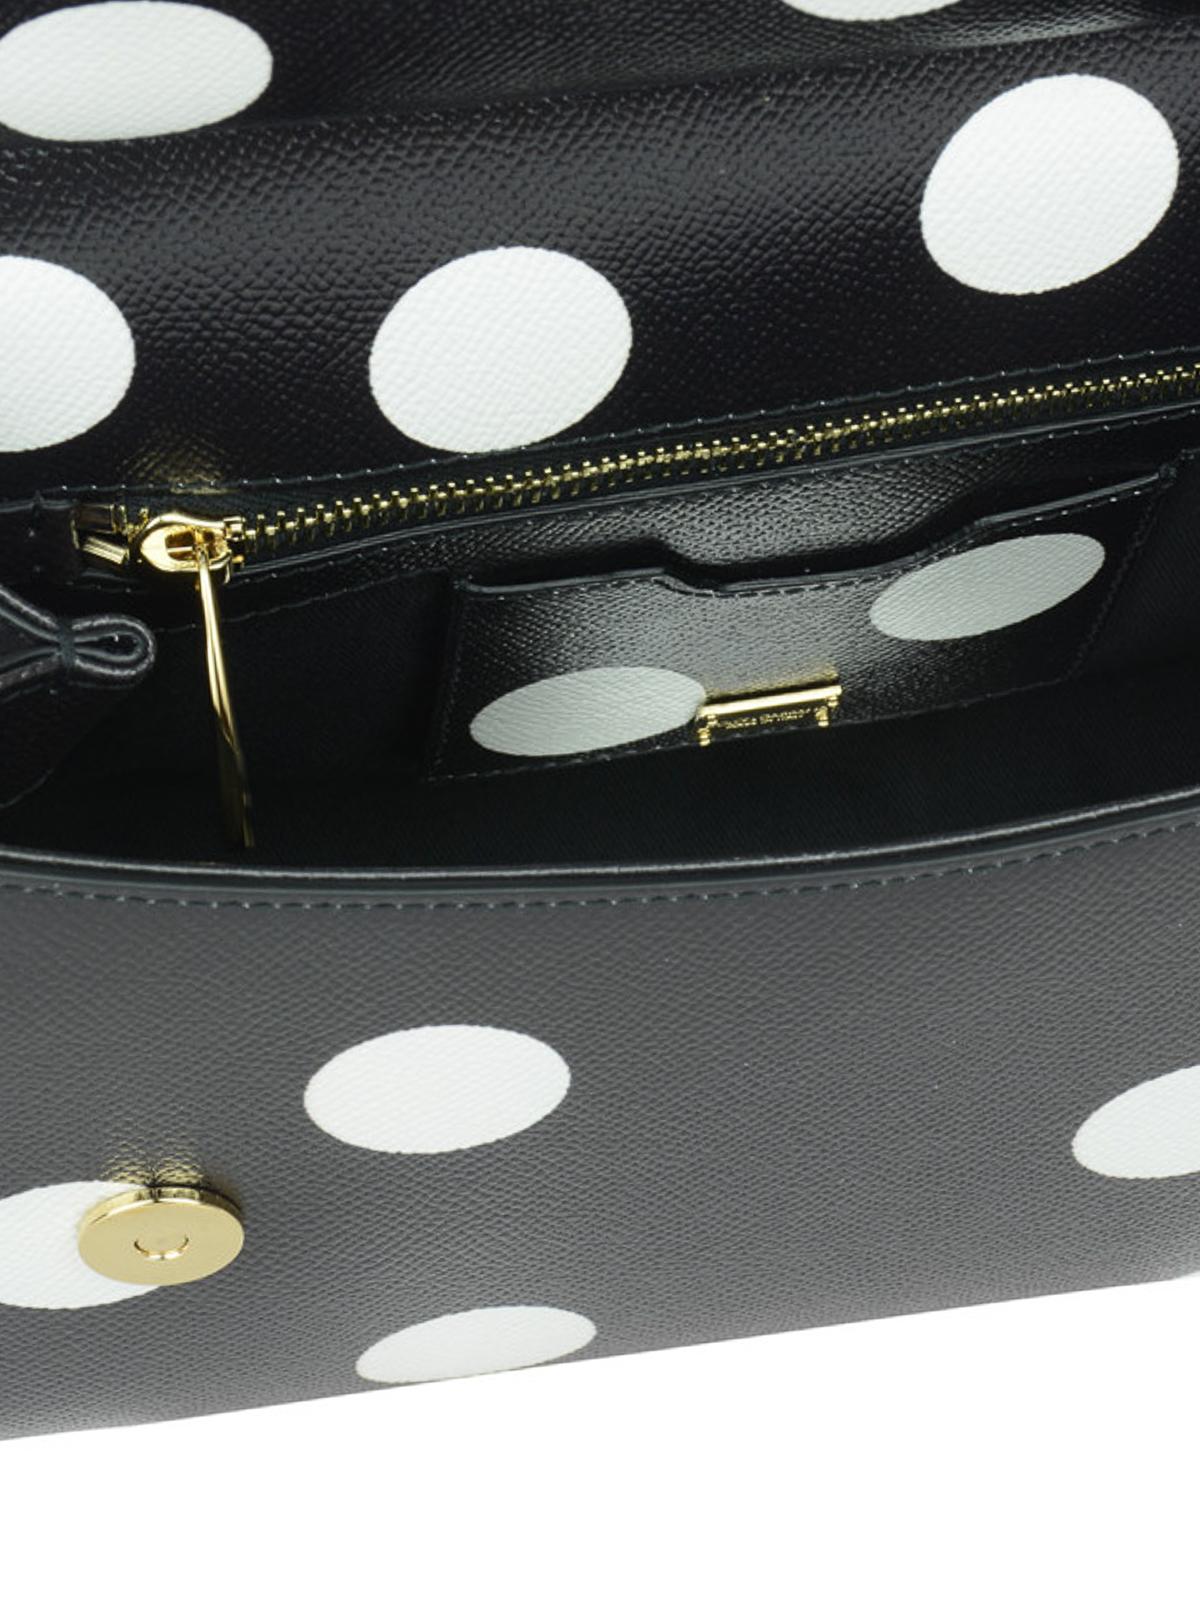 Dolce   Gabbana - Floral polka dot Sicily Medium bag - totes bags ... 3f44c637e3631